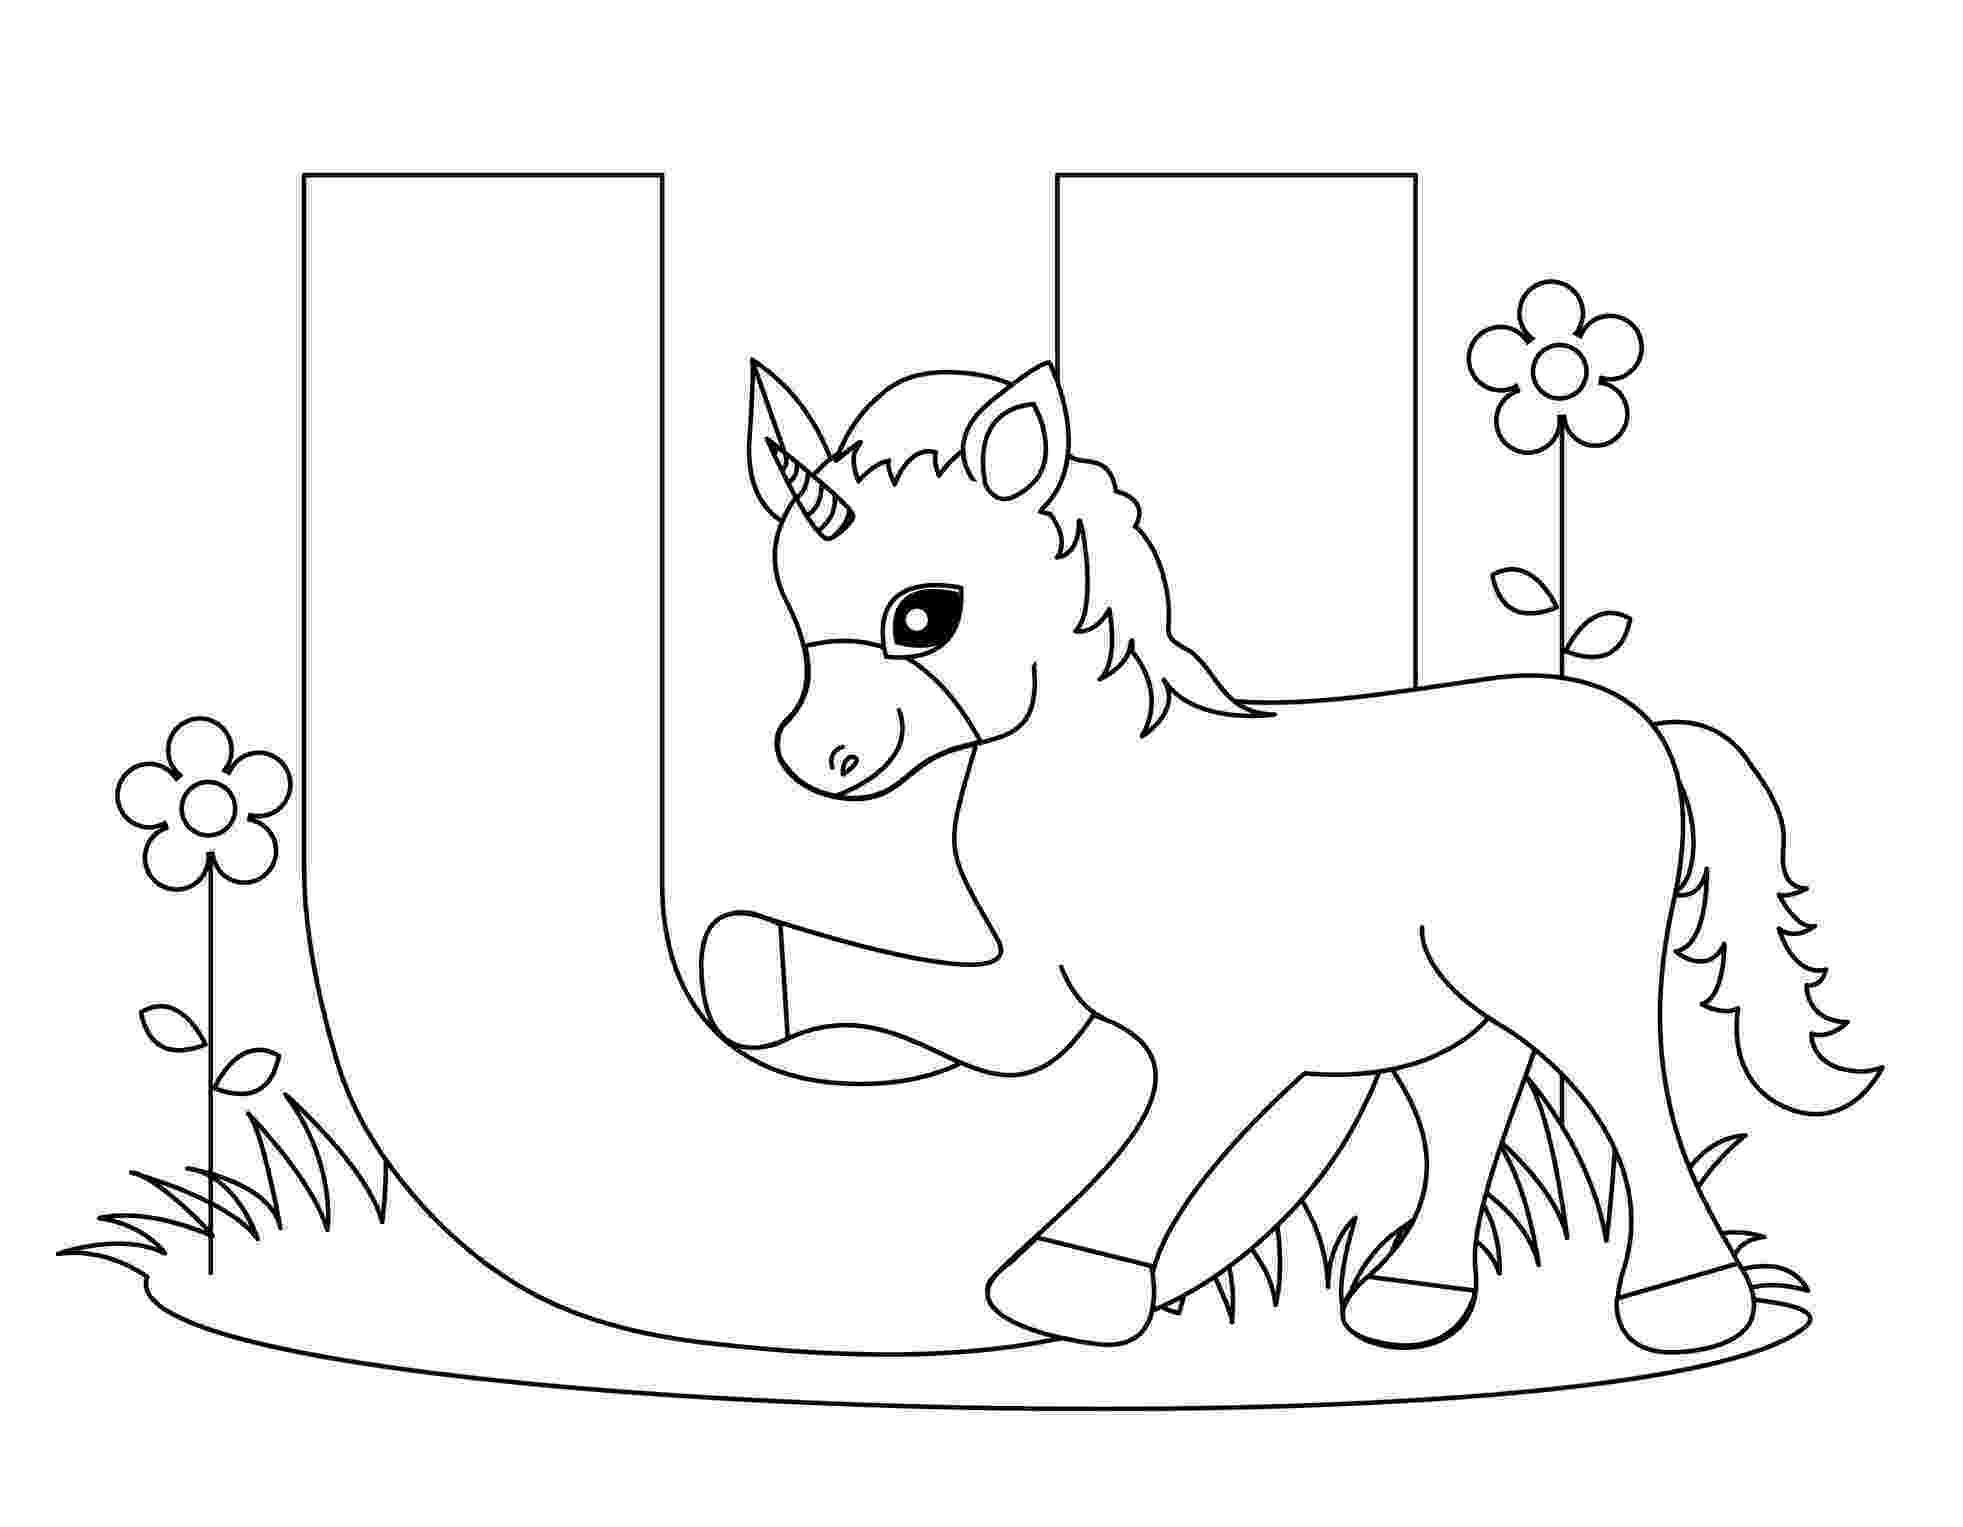 coloring book alphabet free printable alphabet coloring pages for kids best alphabet book coloring 1 2